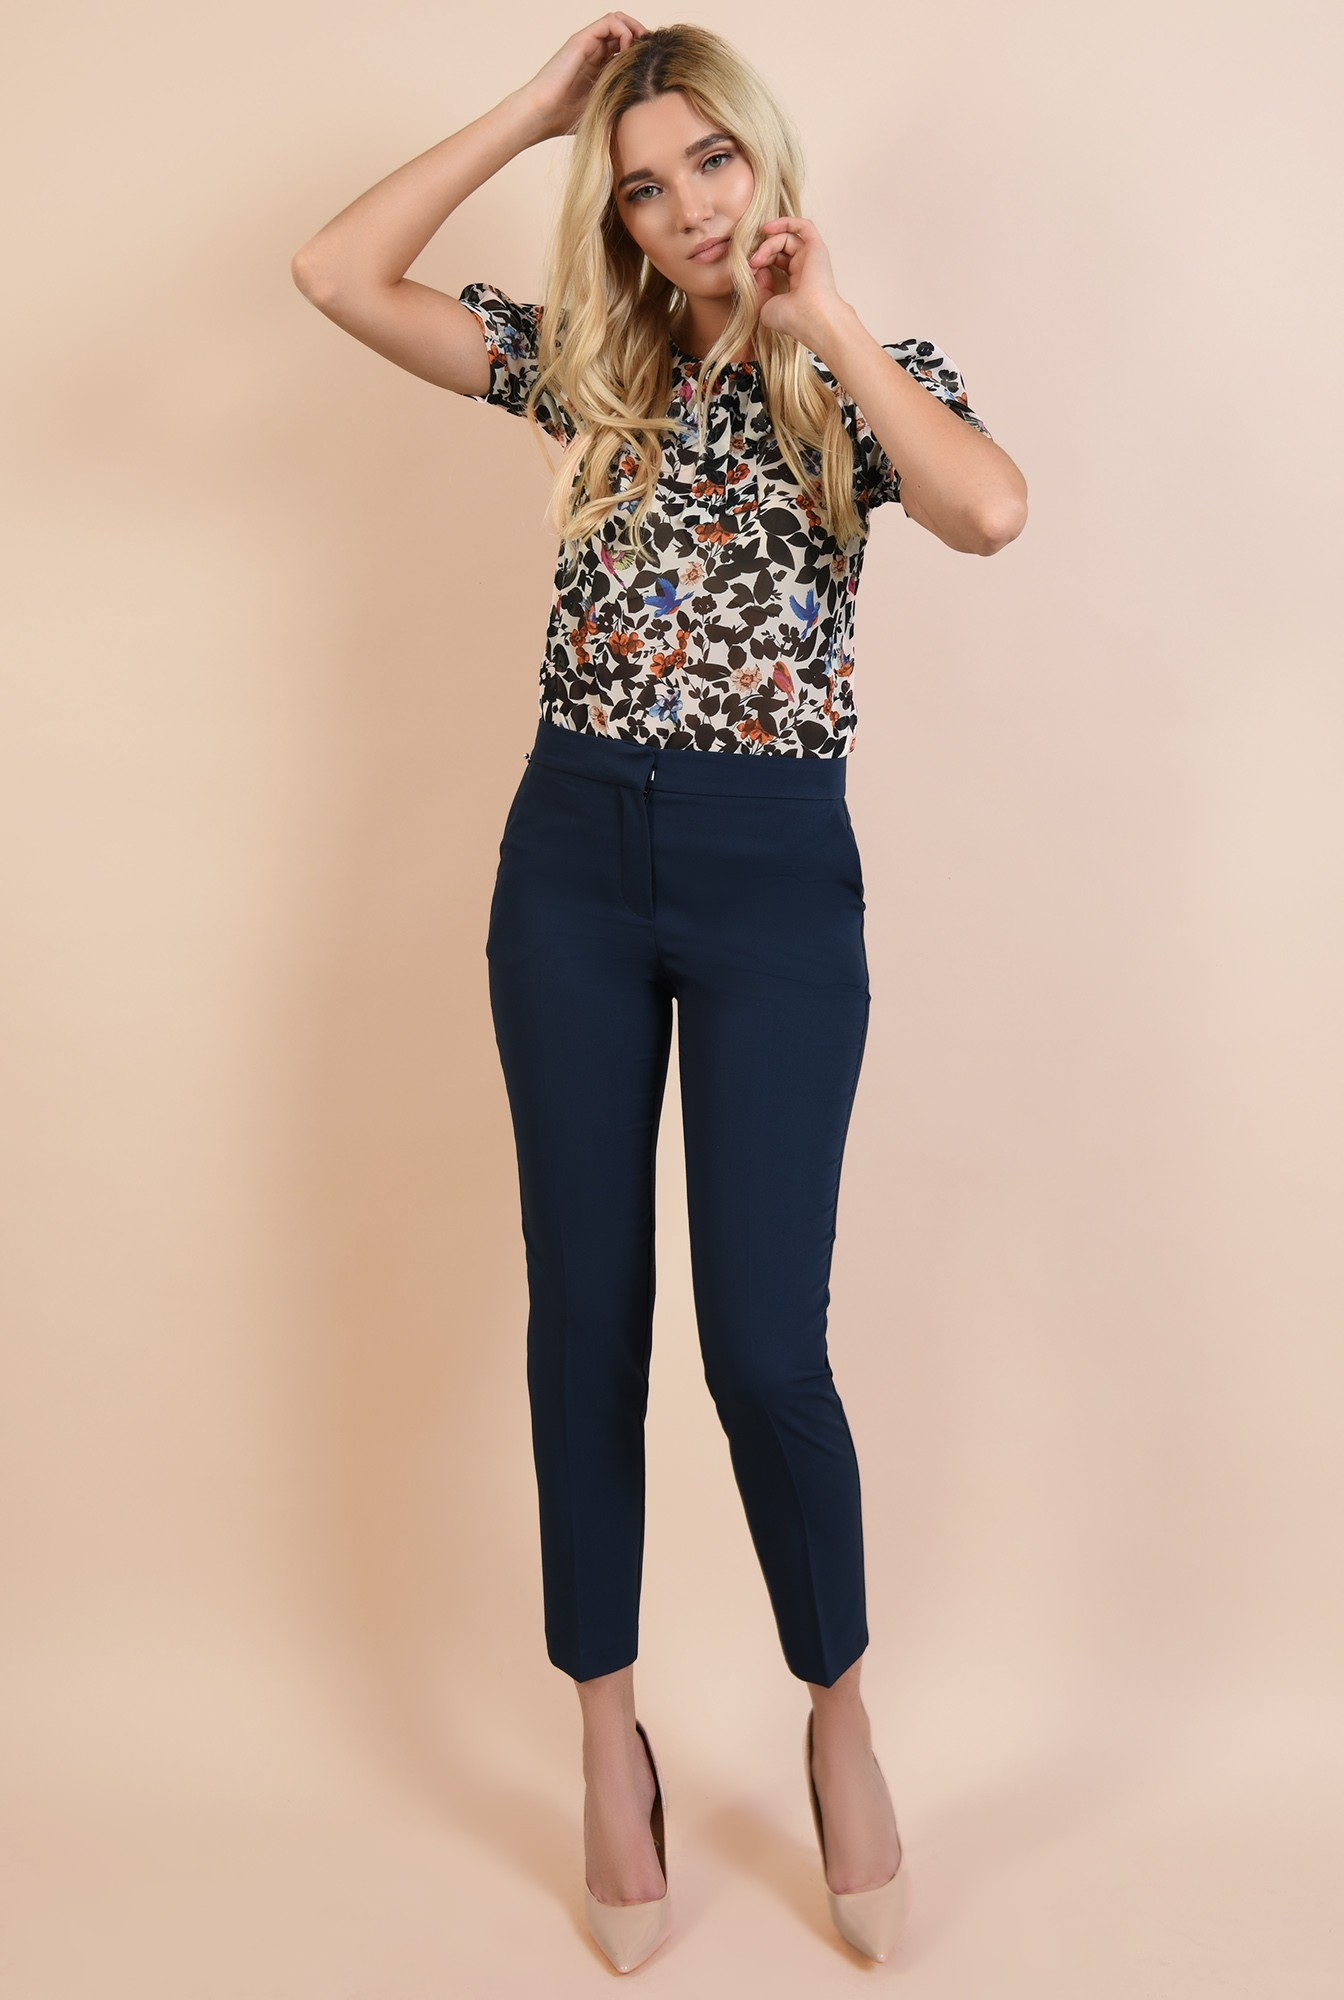 0 - 360 - pantaloni bleumarin, tigareta, cu buzunare, croi conic la dunga